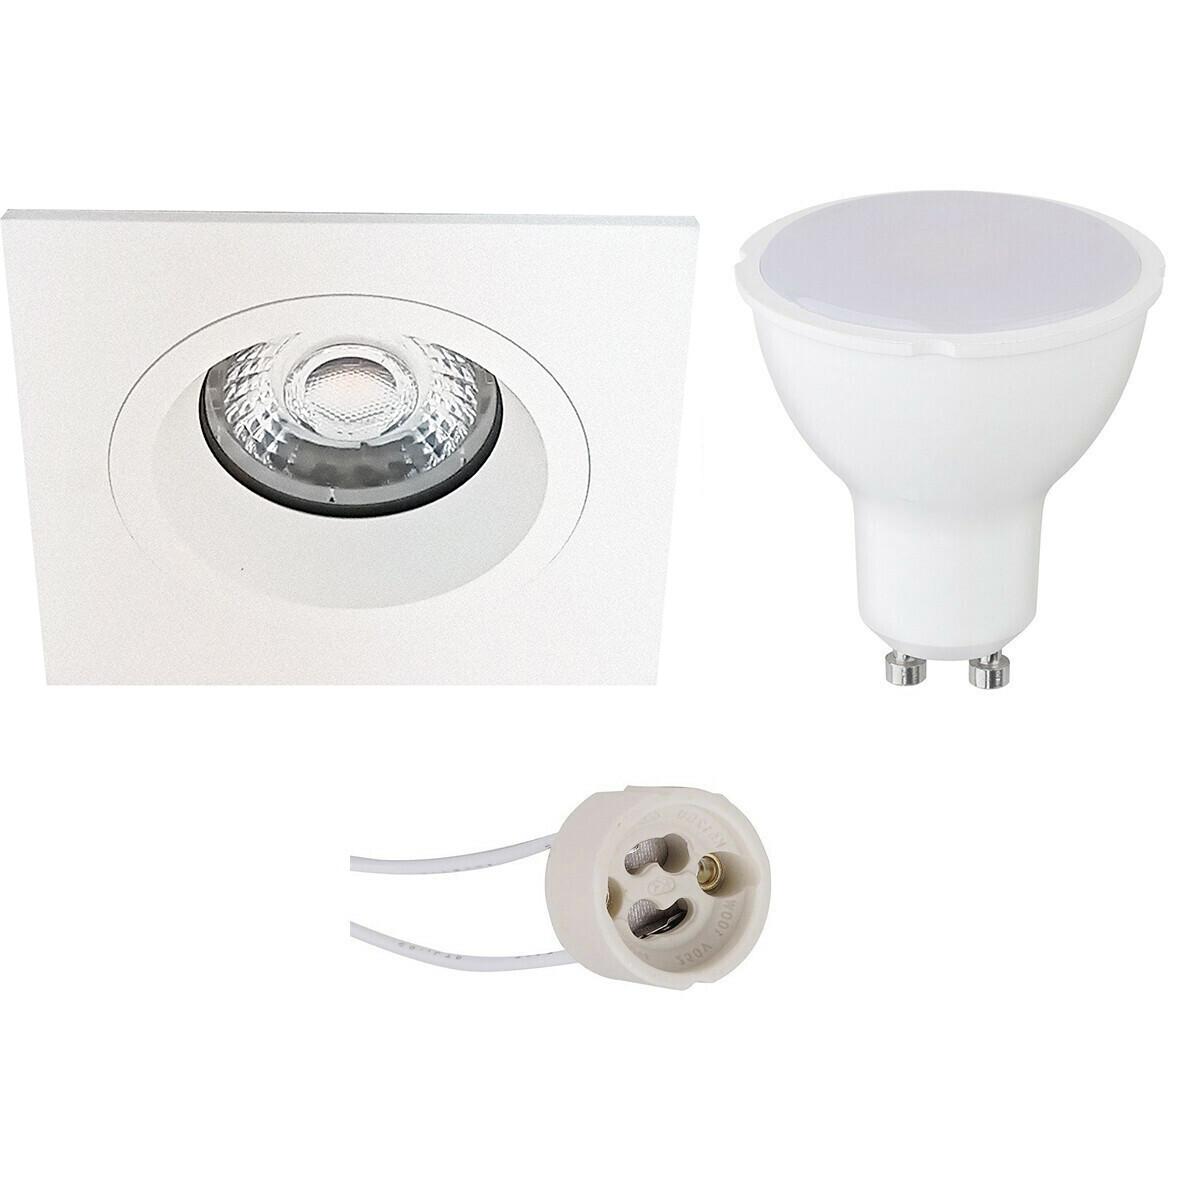 LED Spot Set - Aigi - Pragmi Rodos Pro - GU10 Fitting - Inbouw Vierkant - Mat Wit - 8W - Helder/Koud